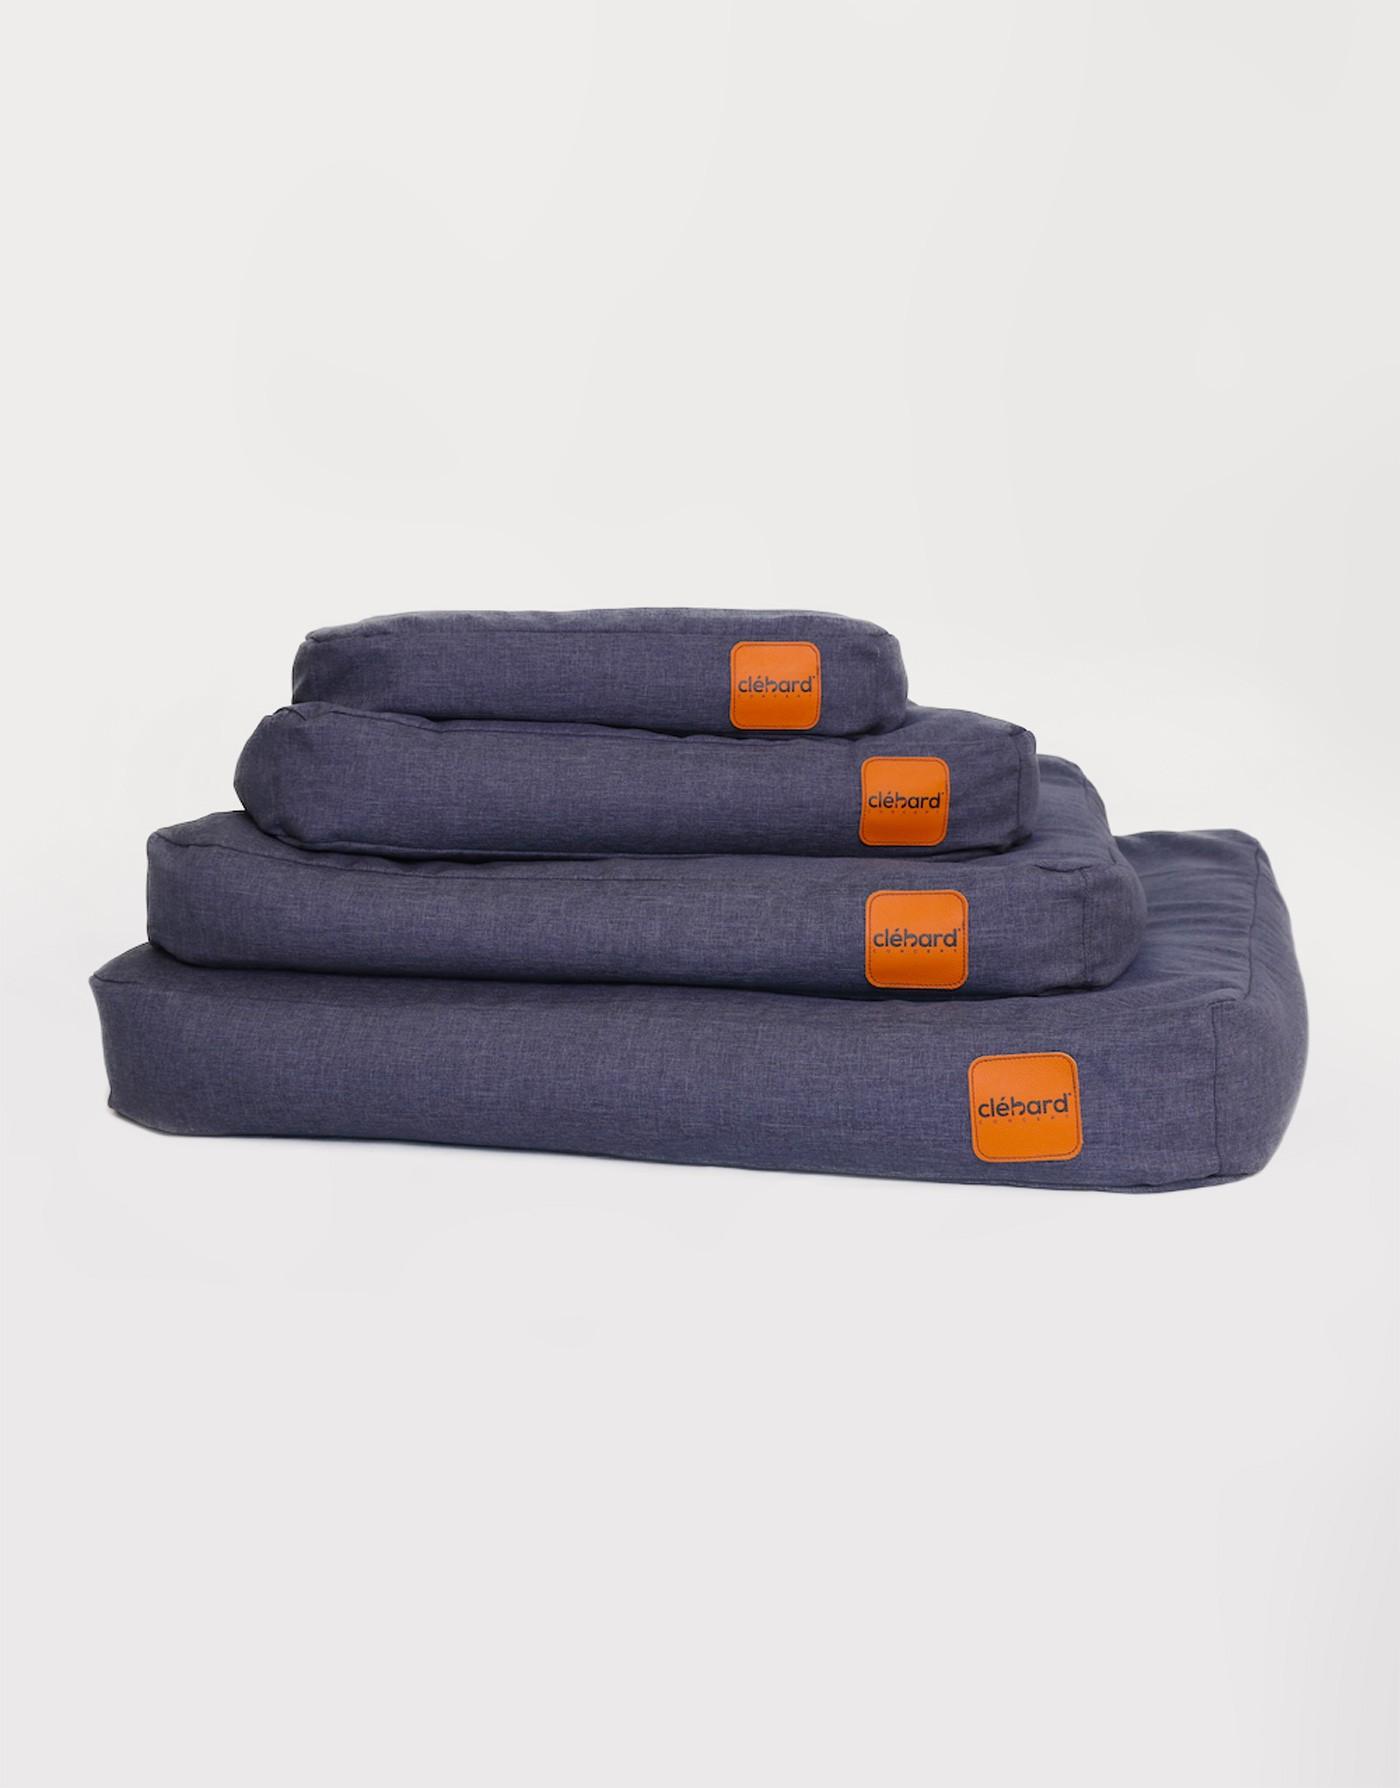 Elegant Dog's Cushion - Linen - Dark Jeans